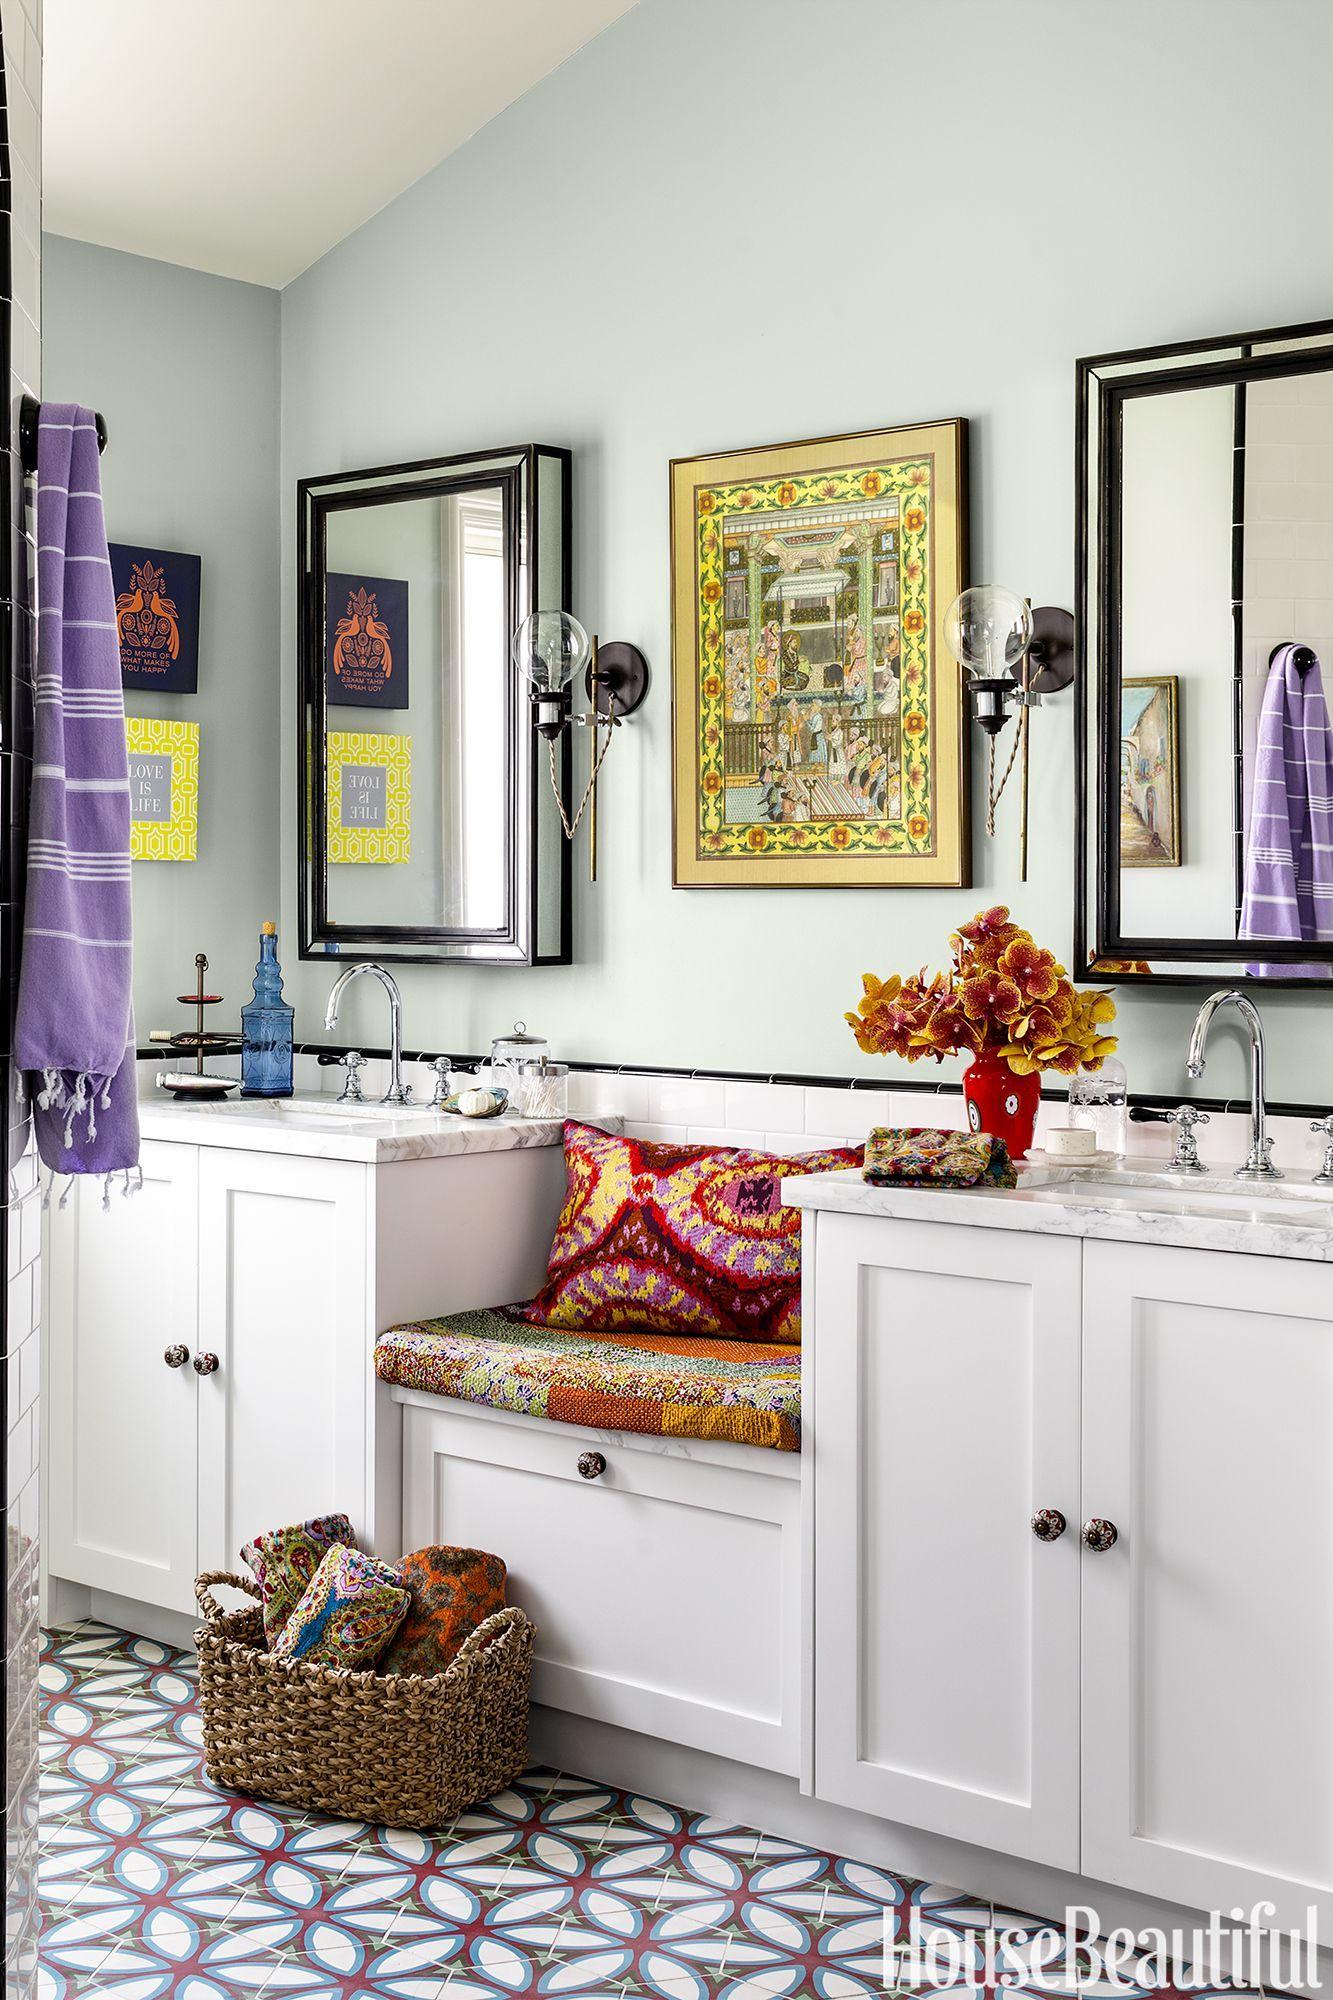 Photo of 30 Bohemian Room Decor Ideas for the Modern Free Spirit